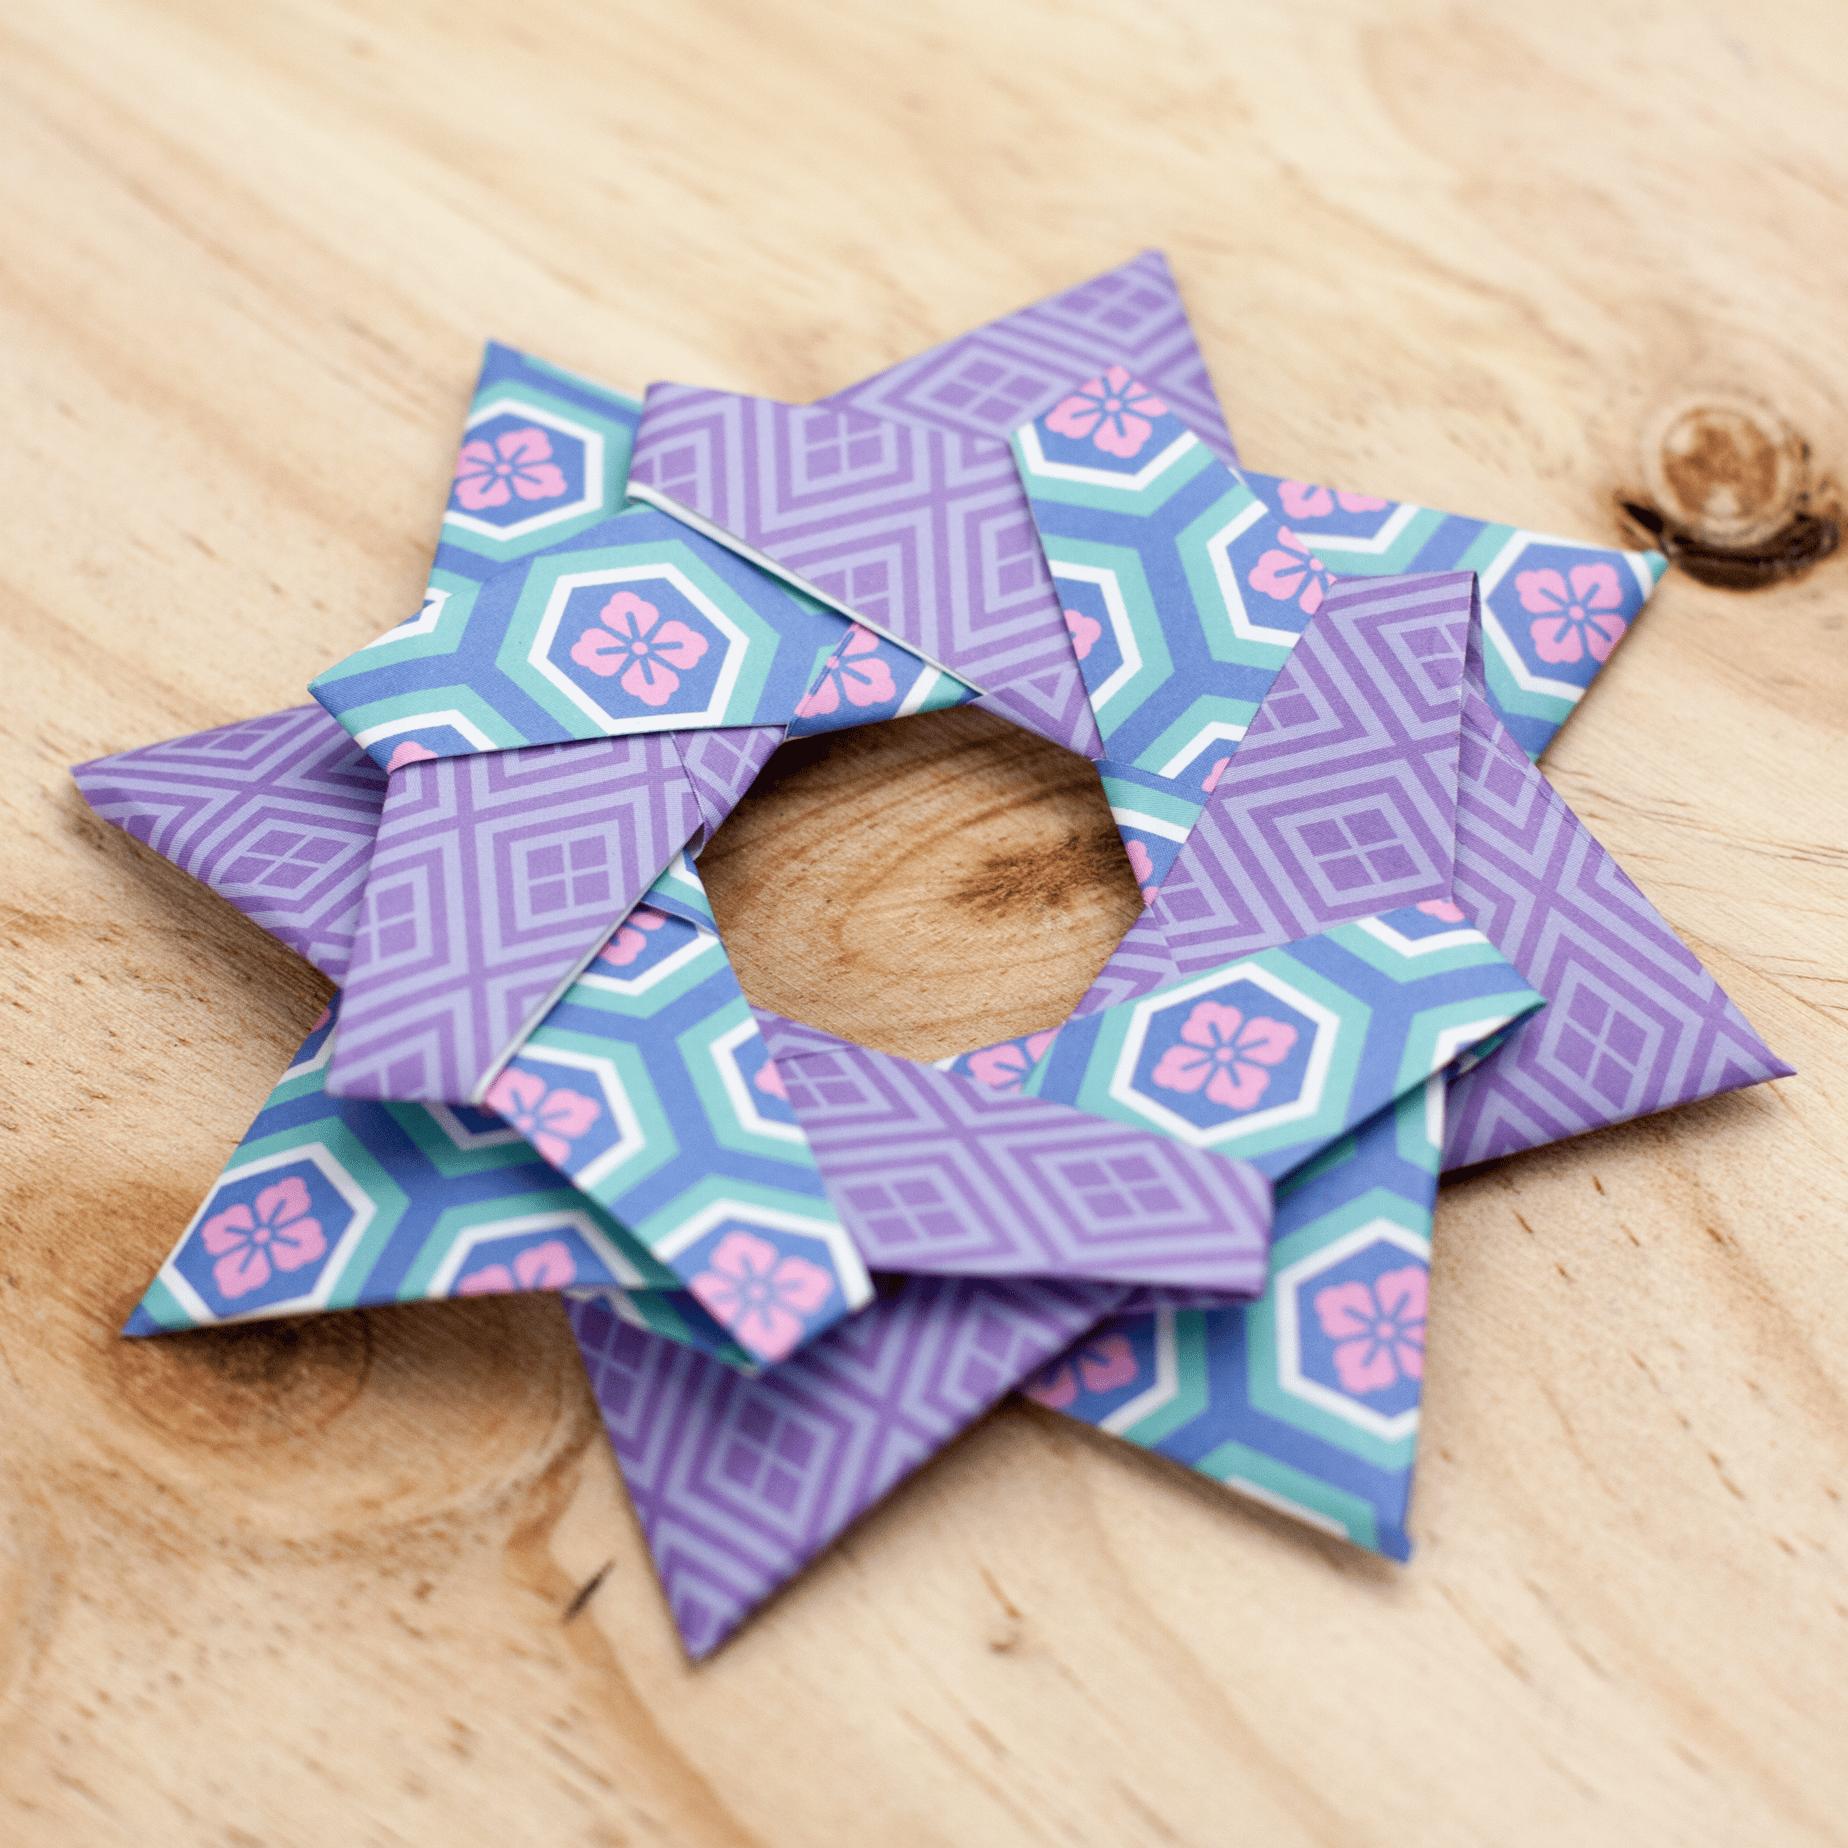 robin-star-origami-estrella-mandala-02